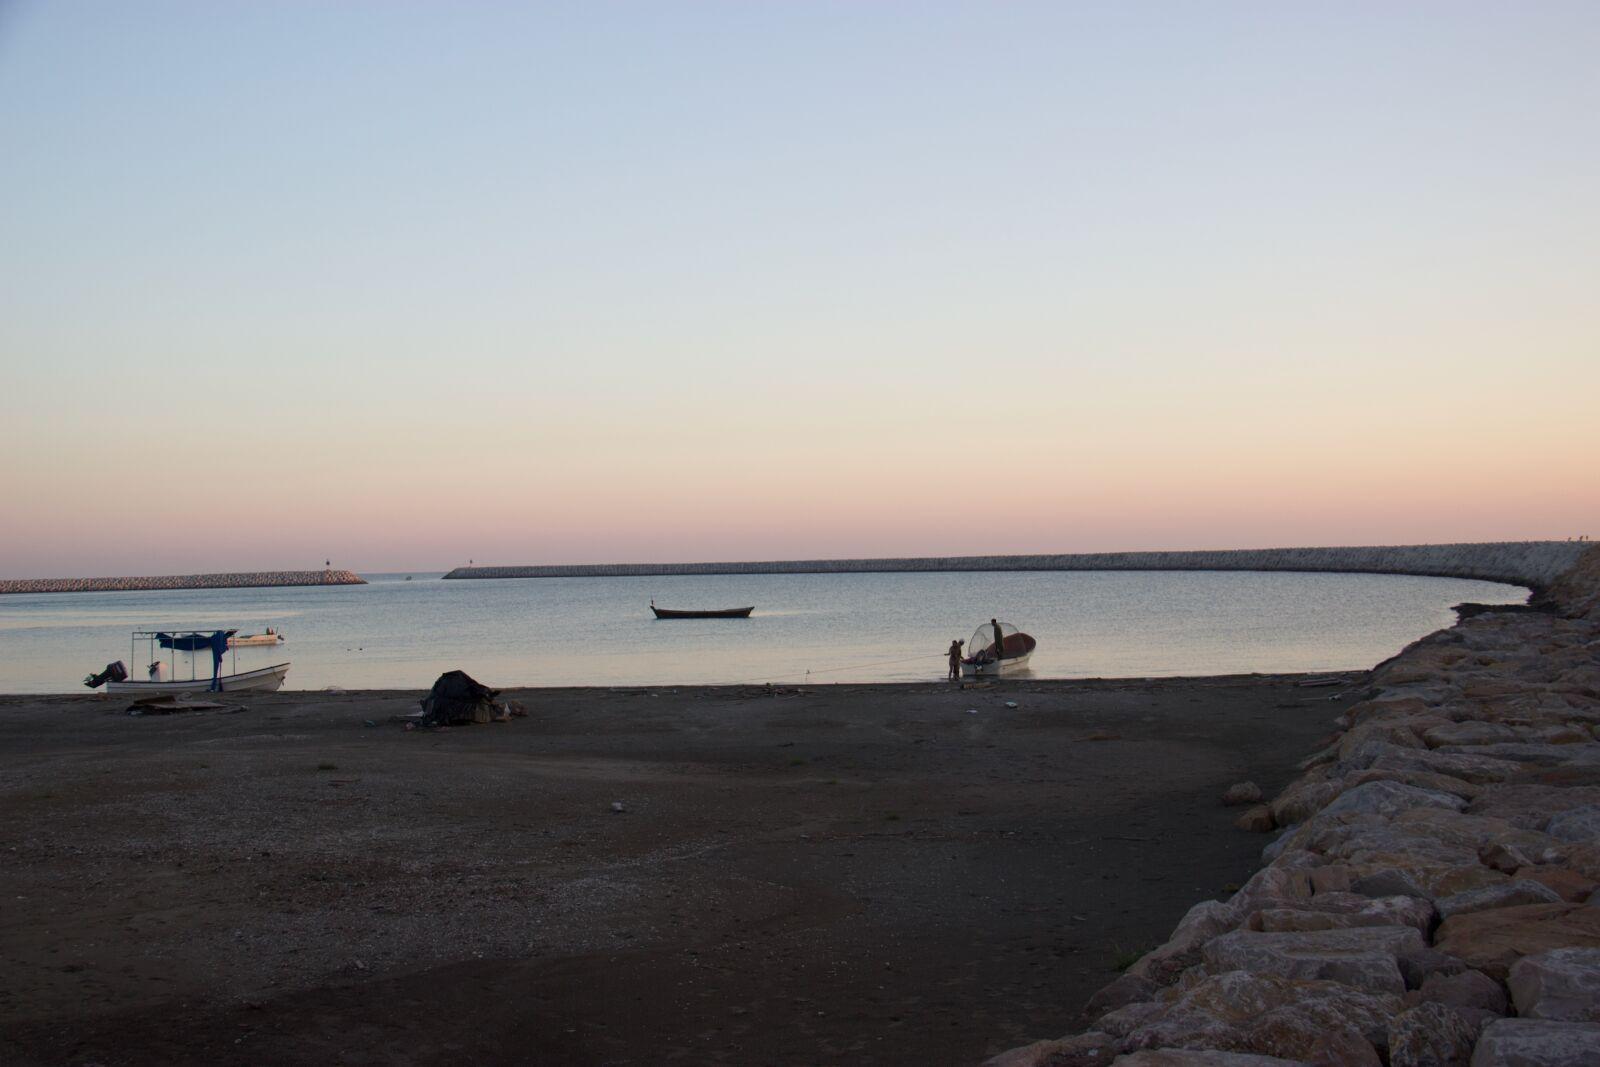 "Canon EOS 600D (Rebel EOS T3i / EOS Kiss X5) sample photo. ""Good morning, sohar oman"" photography"